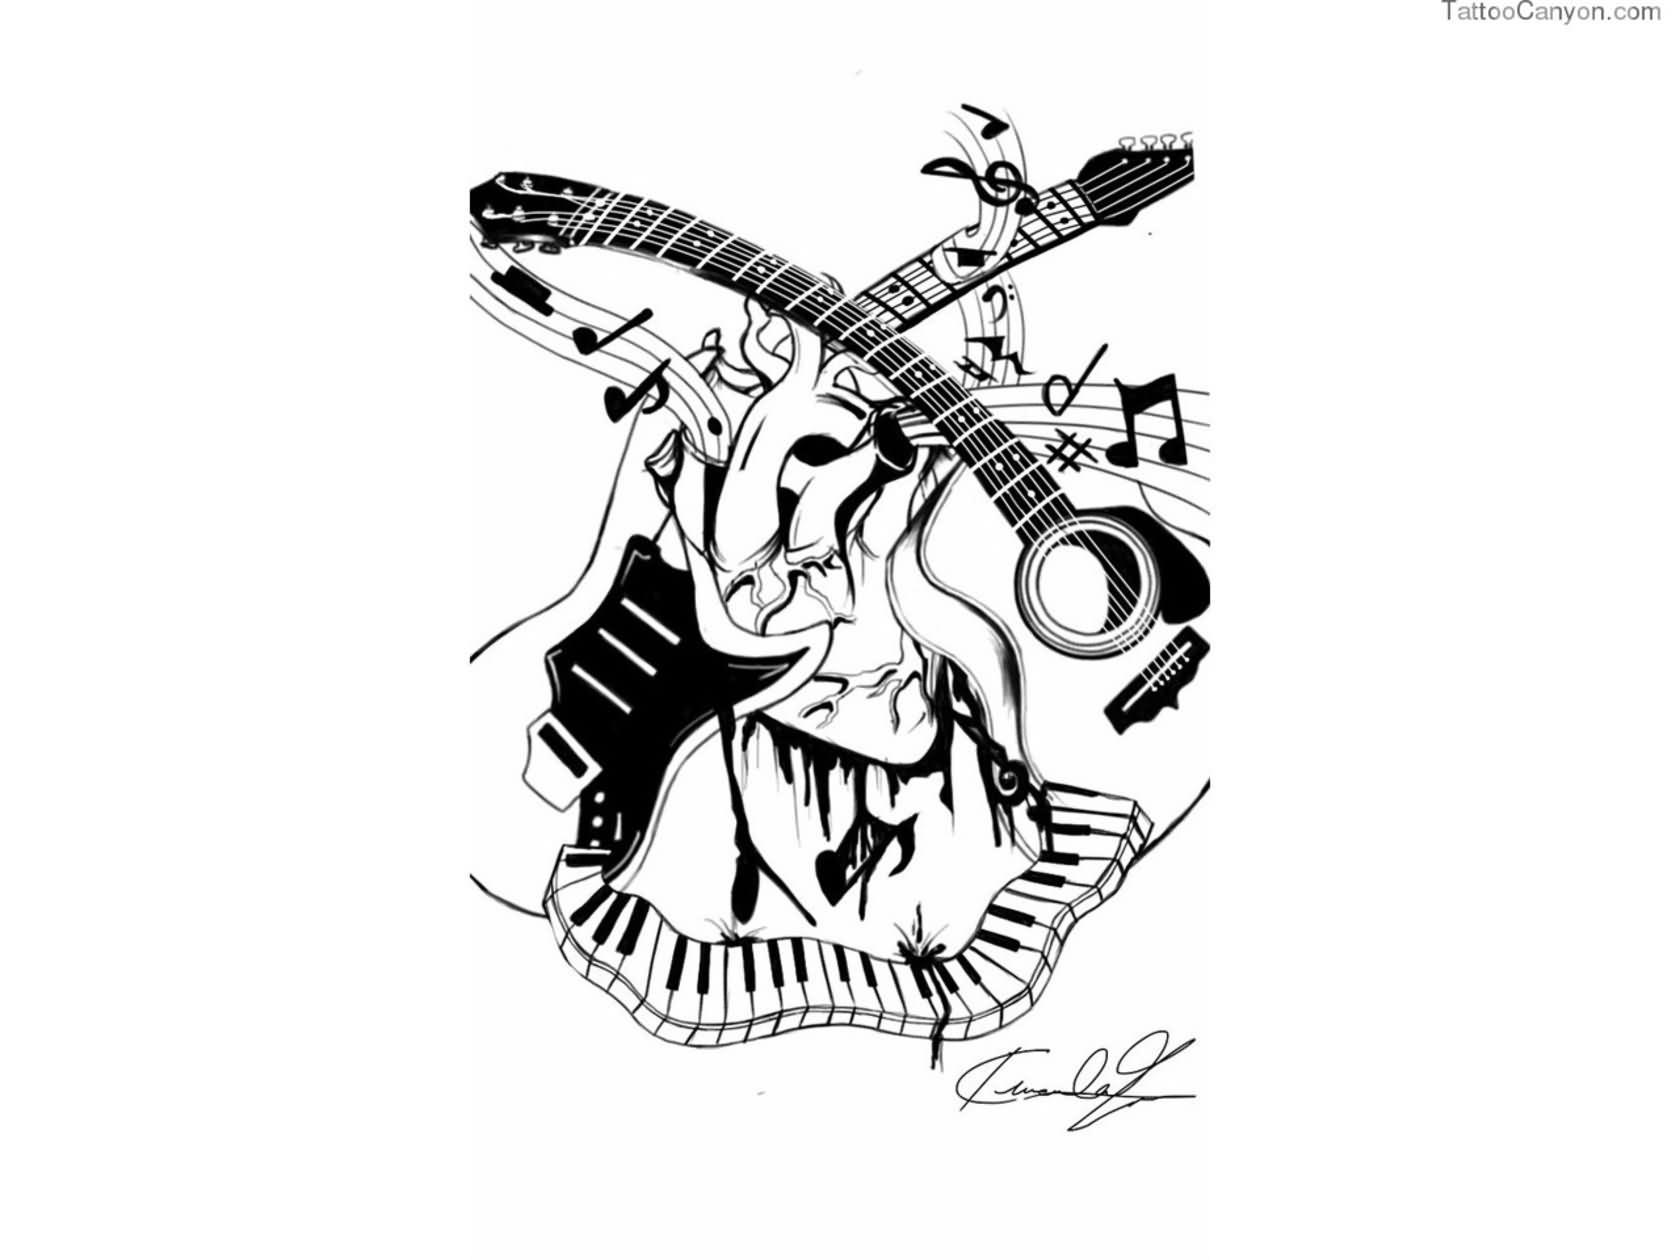 Music tattoo designs tattoo ideas pictures tattoo ideas pictures - Music Tattoo Images Designs Music Tattoos